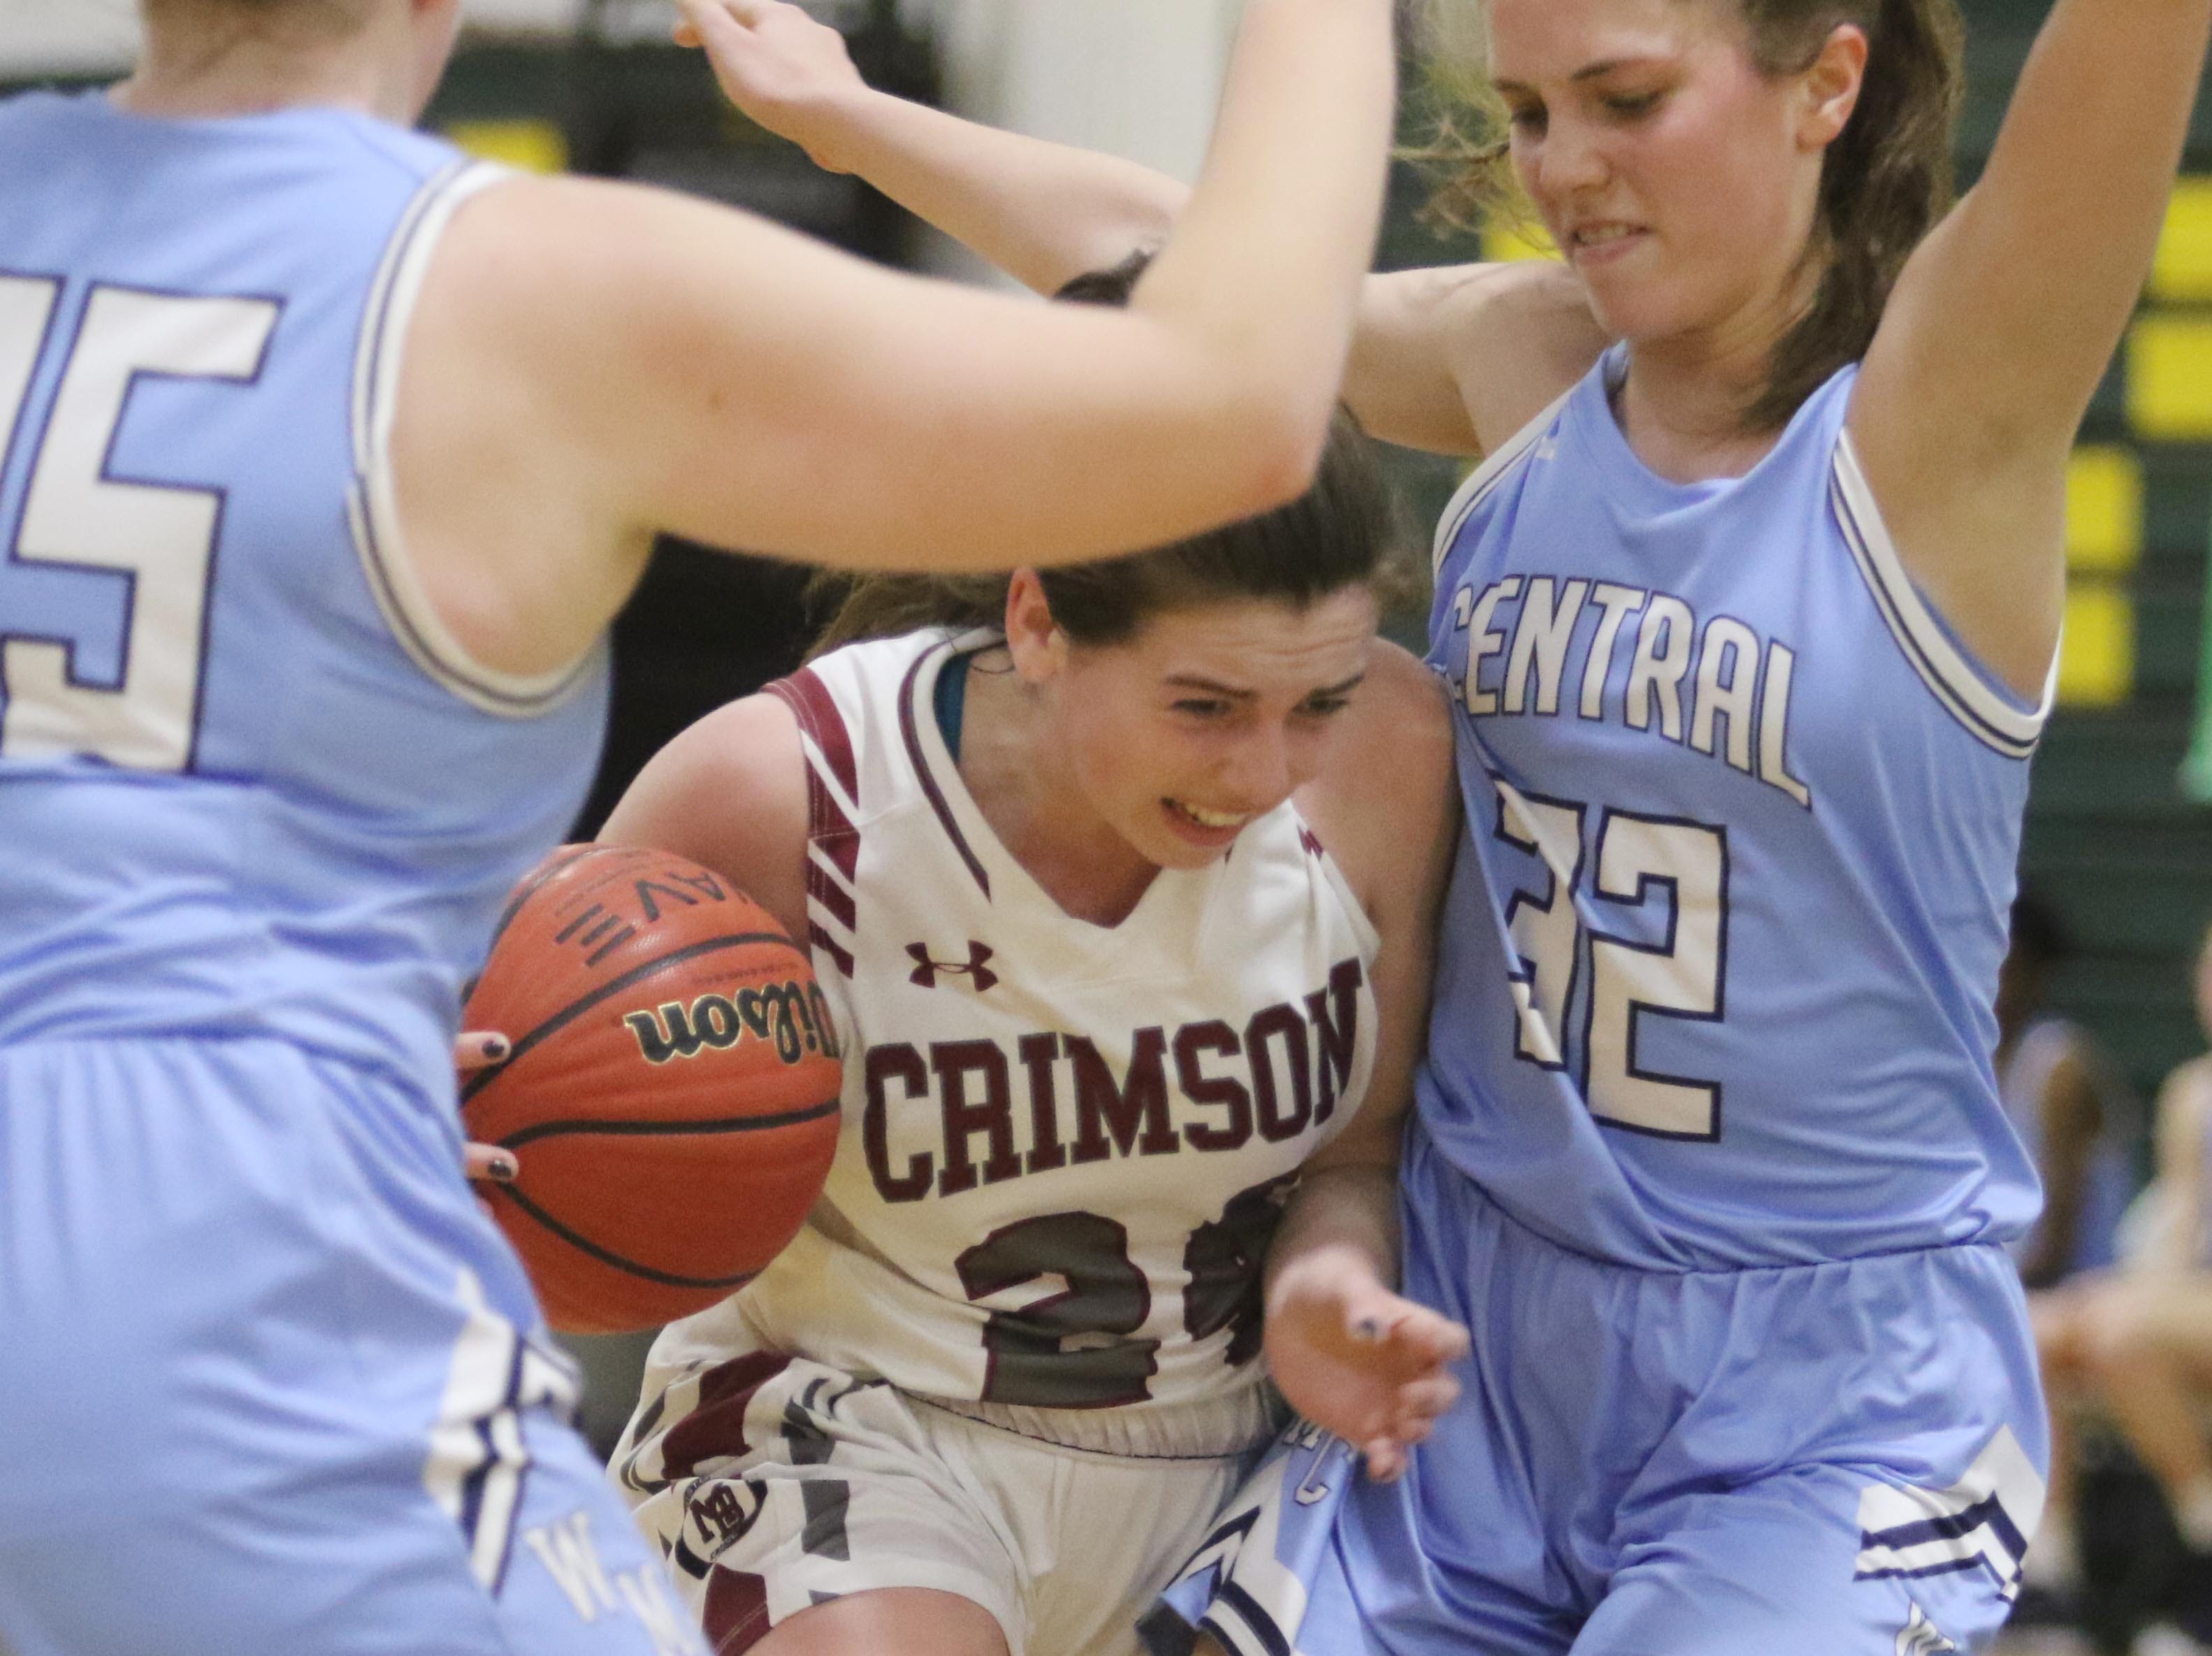 Morristown-Beard senior Bridget Monaghan tries to break through the defense of Olivia Schlok and Elizabeth Mancini of West Morris late in the game.